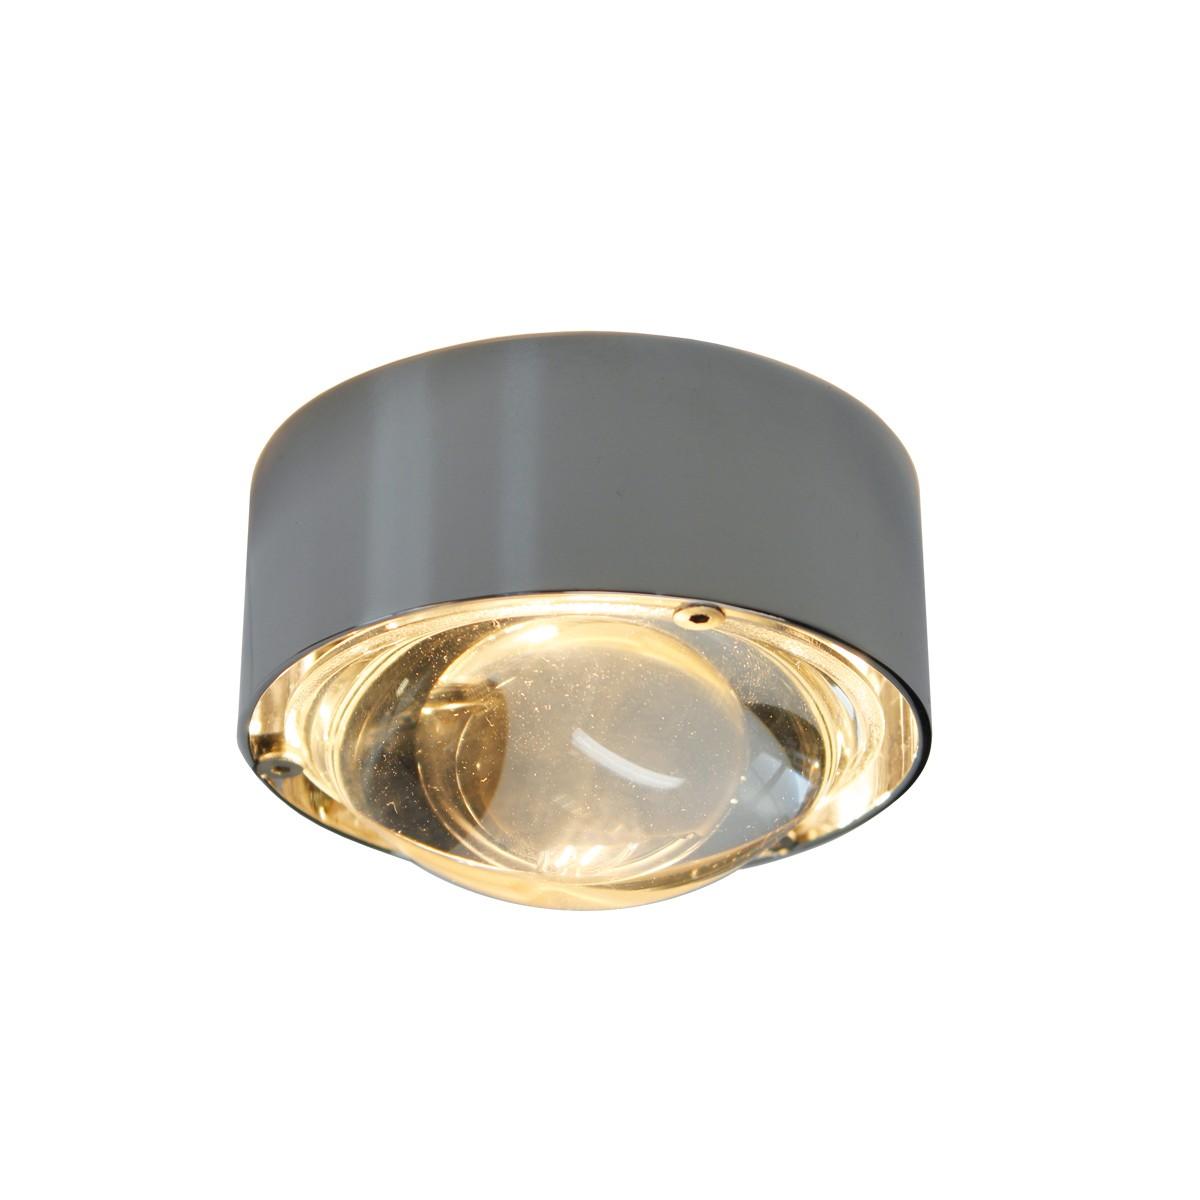 Top Light Puk One LED Deckenleuchte